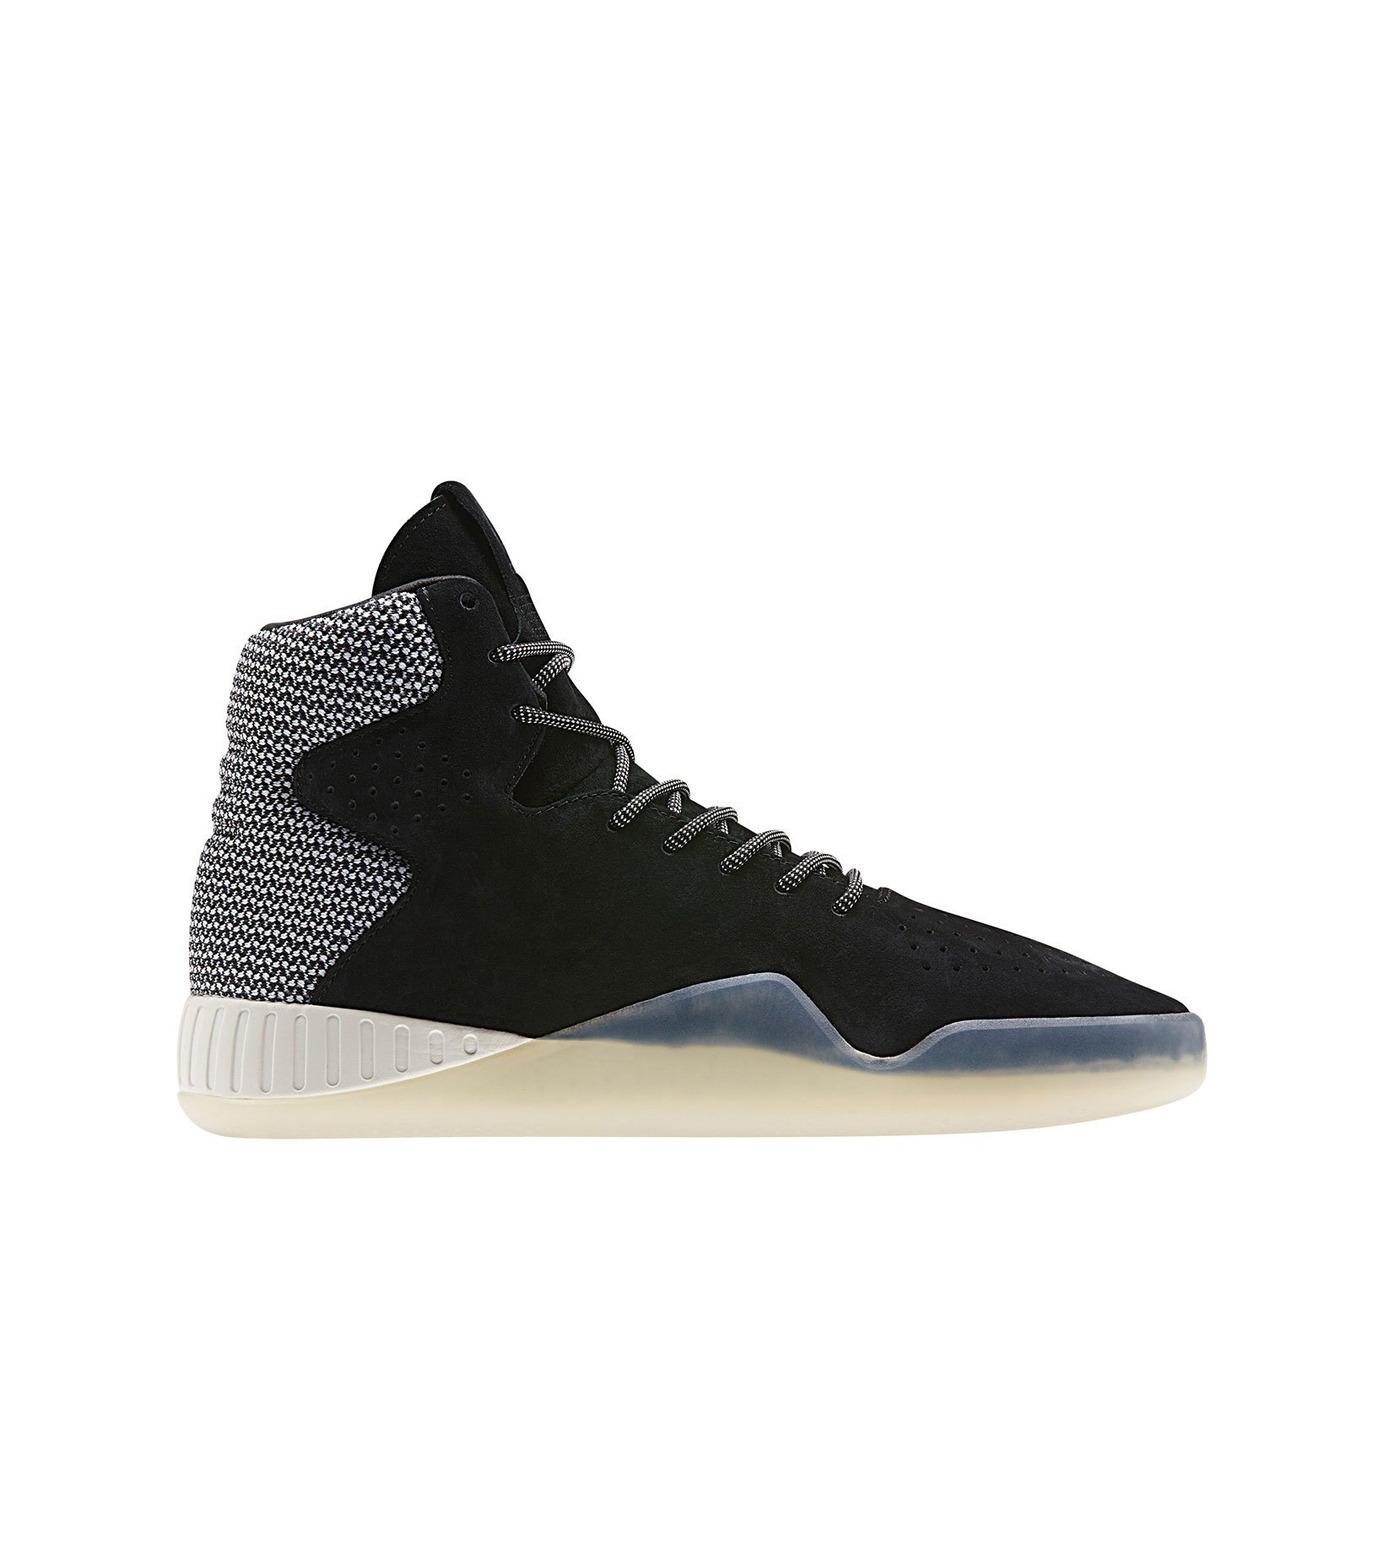 adidas(アディダス)のTUBULAR INSTINCT-BLACK(シューズ/shoes)-S80088-13 拡大詳細画像1